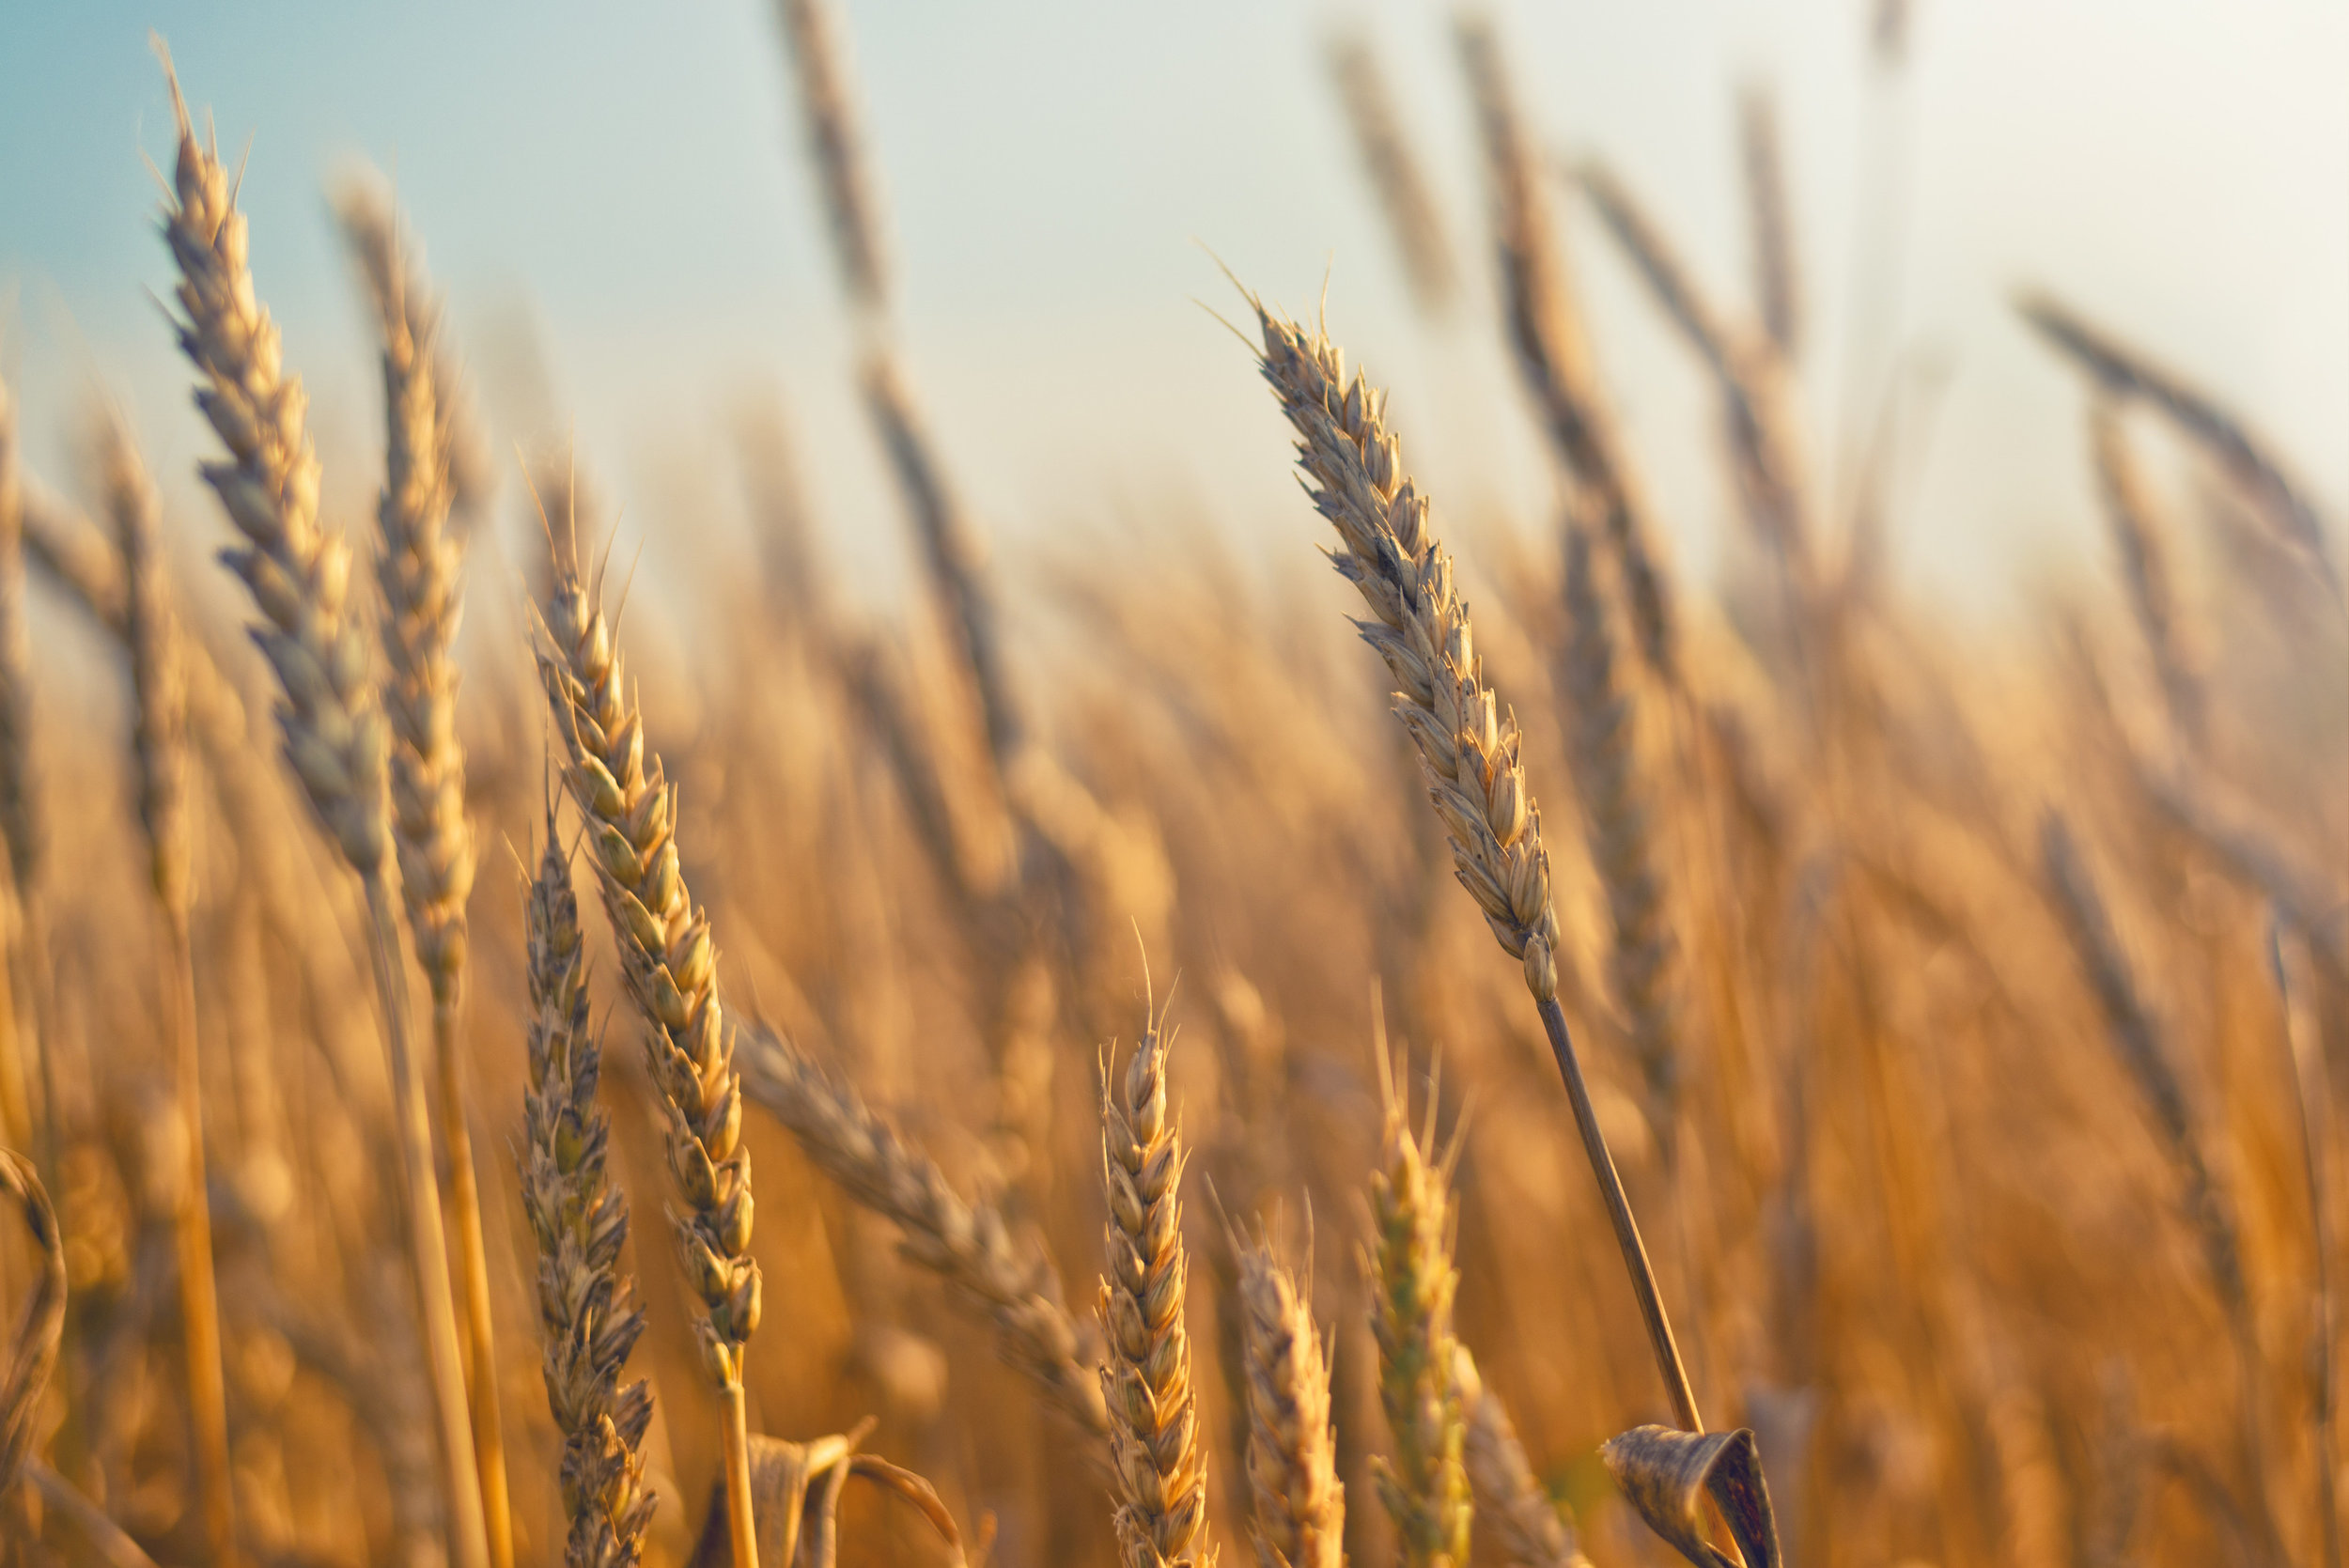 photodune-8197973-wheat-field-l.jpg